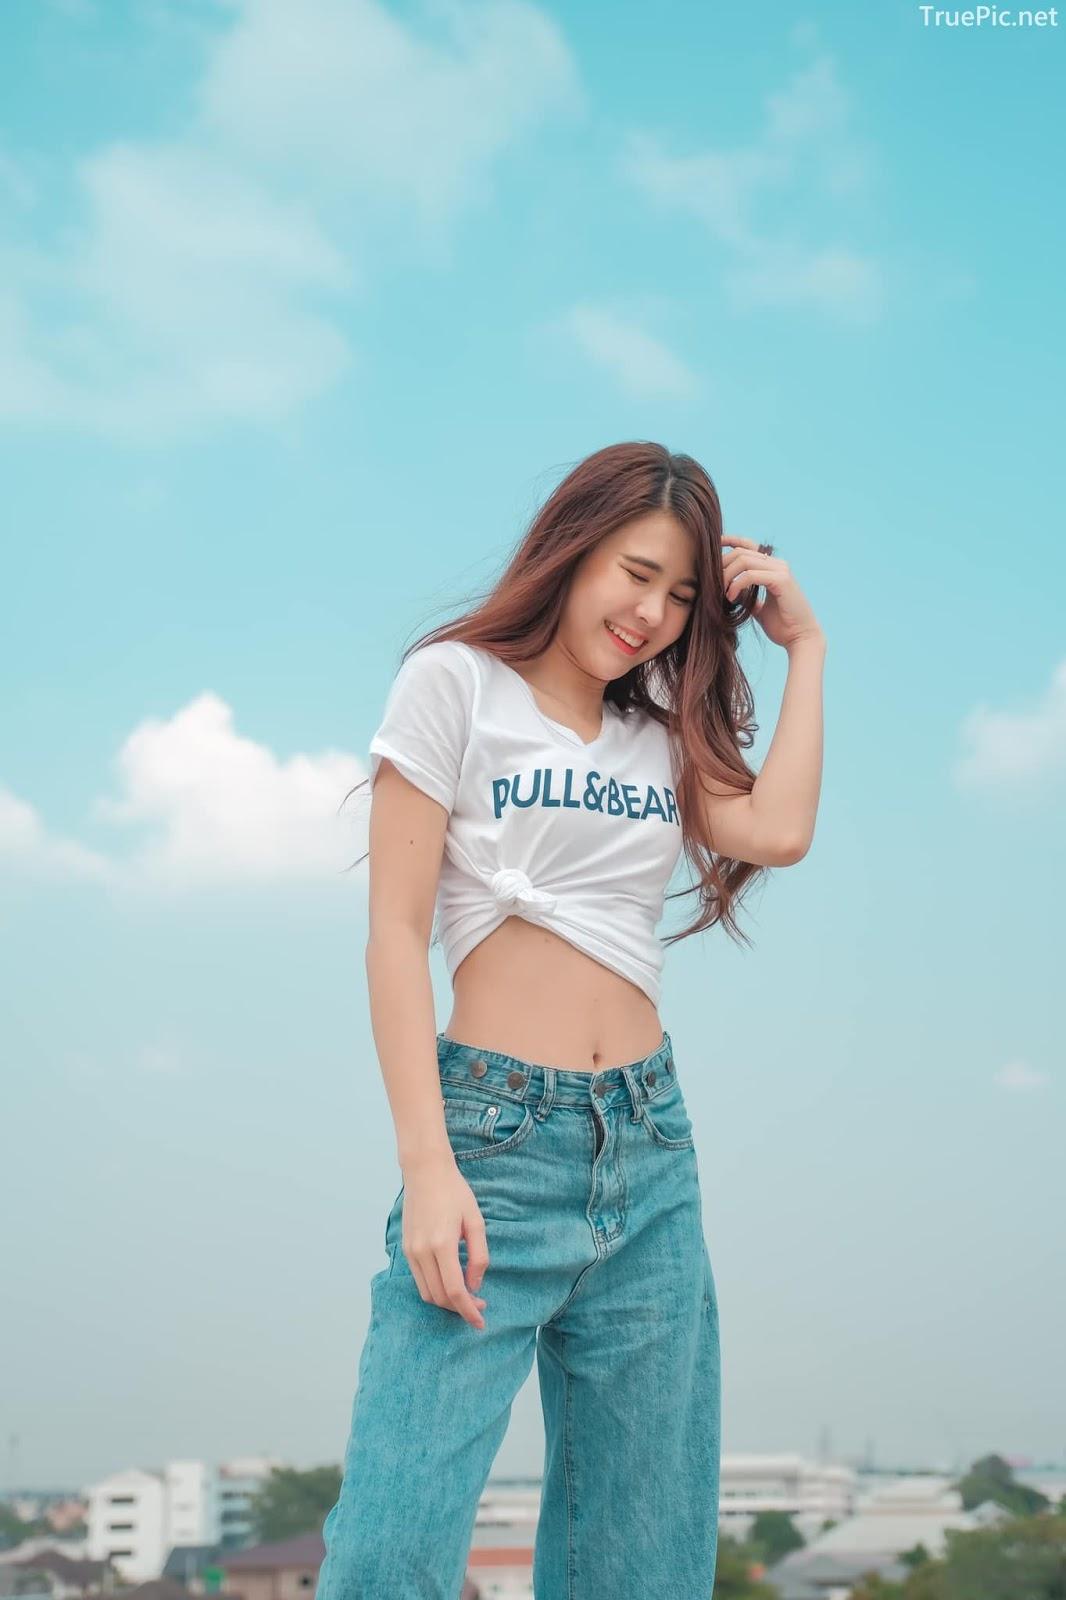 Thailan cute model - Supansa Yoopradit (Lorpor) - The terrace is full of windy afternoon - Picture 1